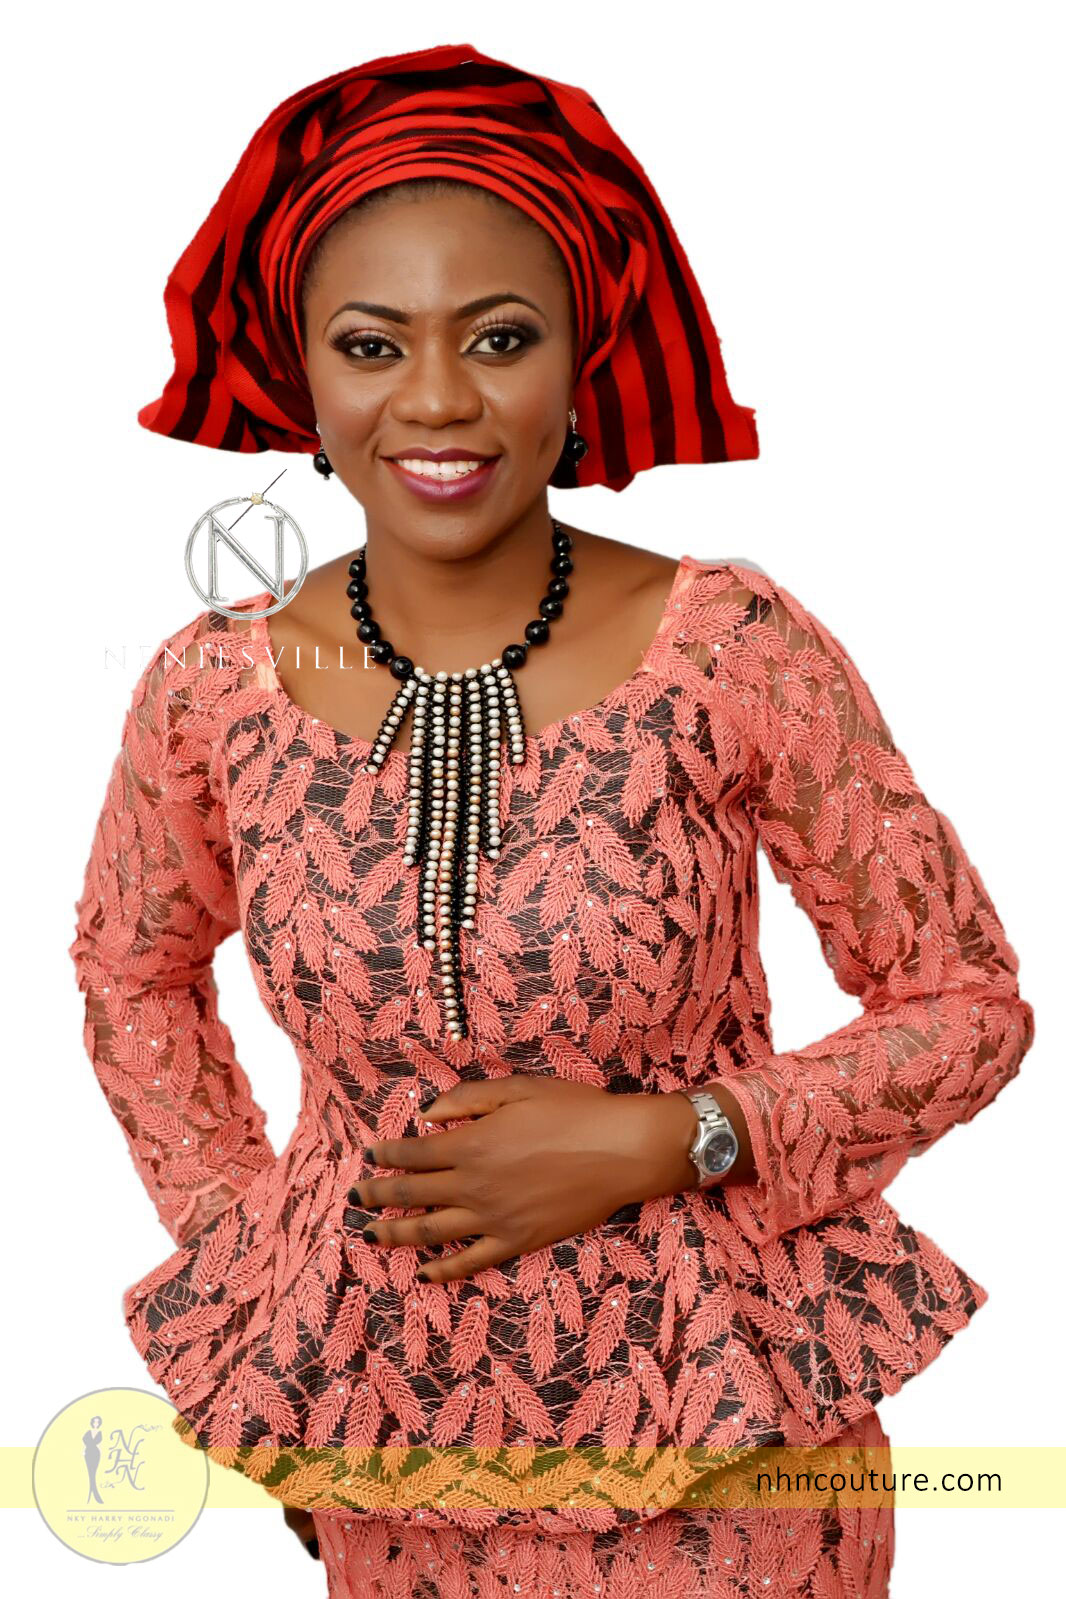 Neniesville-Jewelry_Nigerian-Attire-by-NHN-Couture_2